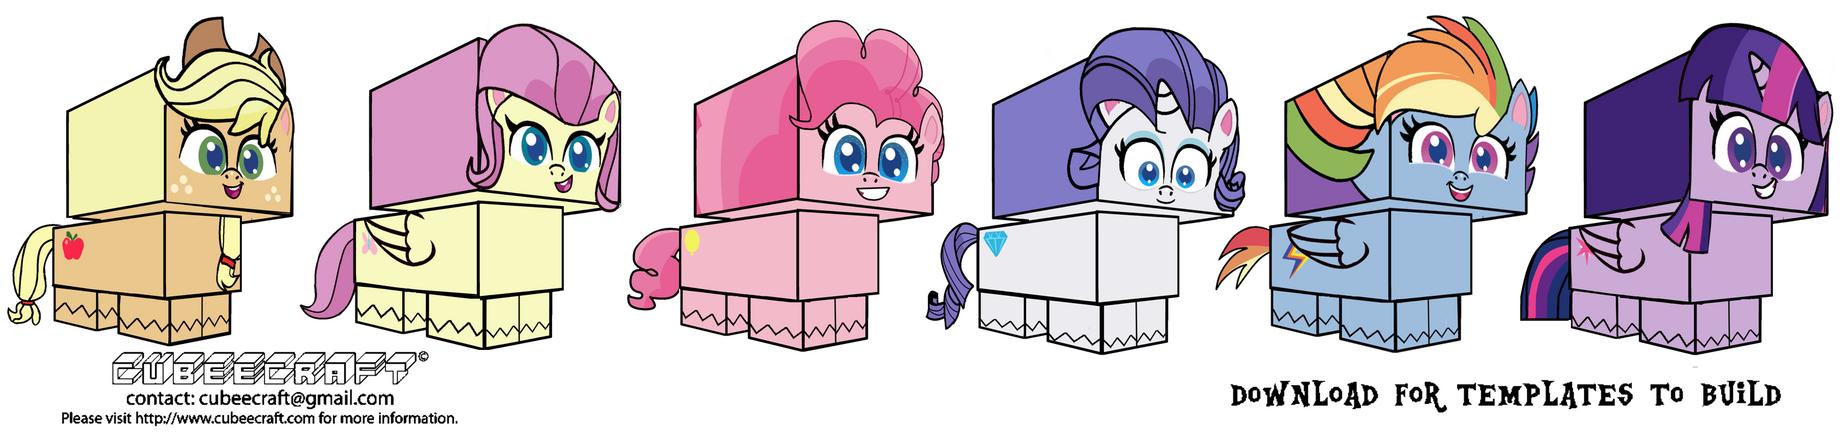 Cubeecraft Ponylife Mane Six